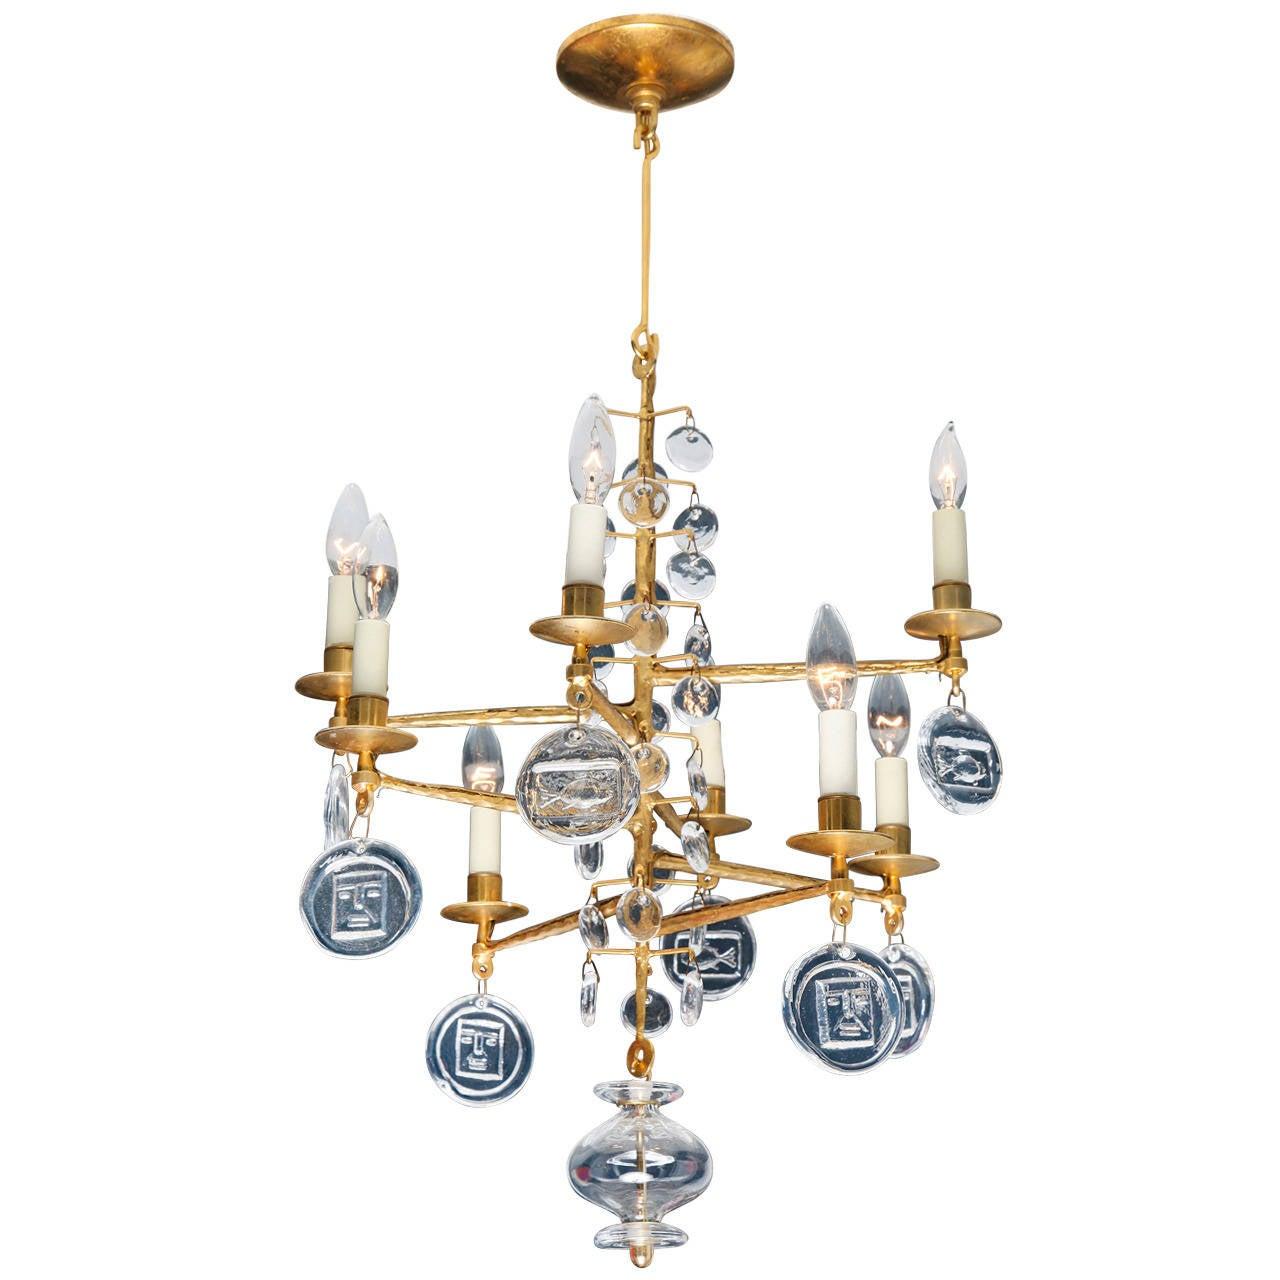 Swedish gilt iron and glass chandelier by erik hoglund at 1stdibs swedish gilt iron and glass chandelier by erik hoglund 1 arubaitofo Gallery